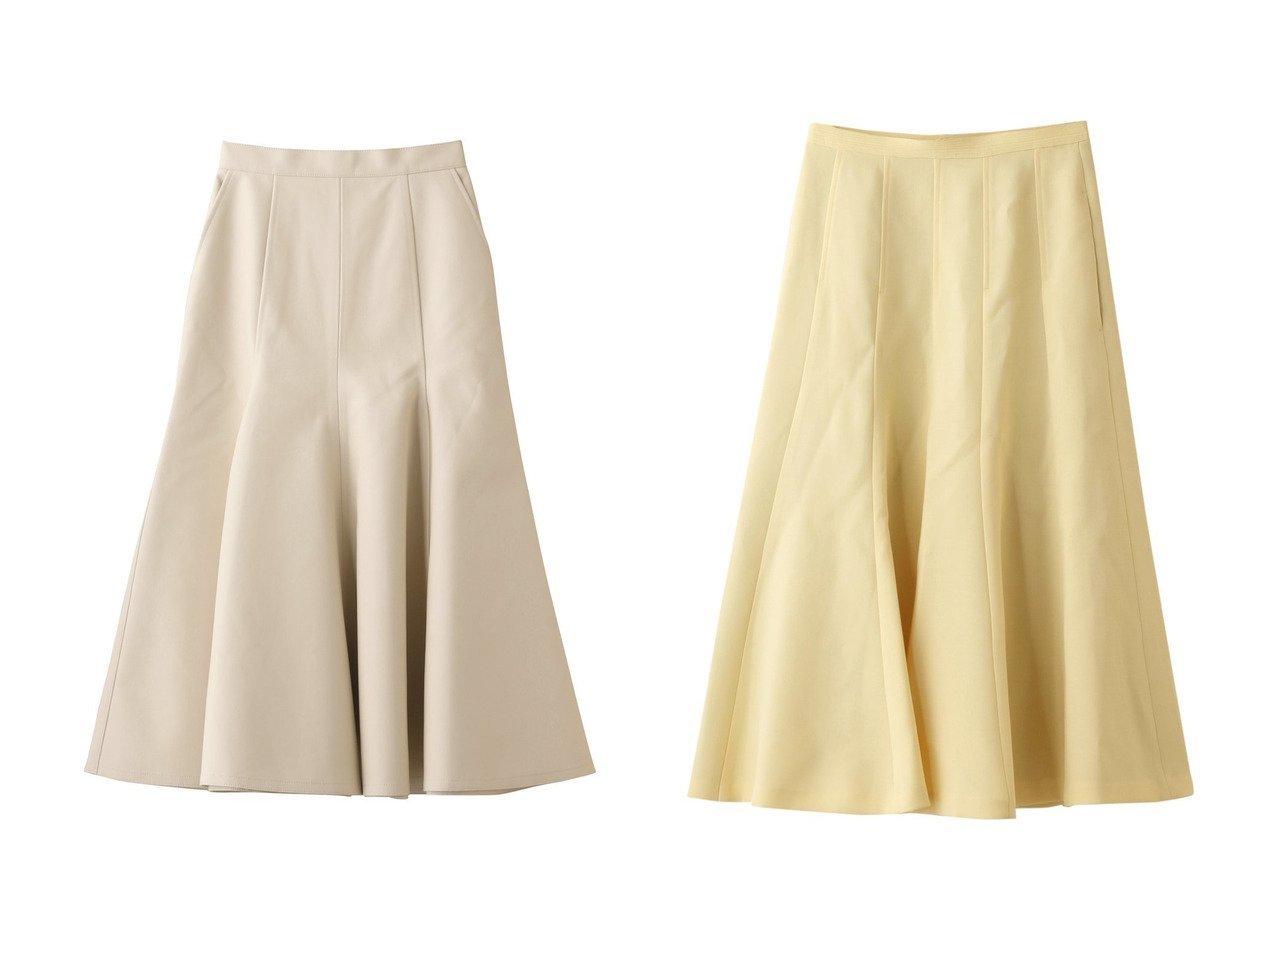 【martinique/マルティニーク】のフレアスカート&【LE CIEL BLEU/ルシェル ブルー】のフェイクレザーマーメイドスカート 【スカート】おすすめ!人気、トレンド・レディースファッションの通販 おすすめで人気の流行・トレンド、ファッションの通販商品 インテリア・家具・メンズファッション・キッズファッション・レディースファッション・服の通販 founy(ファニー) https://founy.com/ ファッション Fashion レディースファッション WOMEN スカート Skirt ロングスカート Long Skirt Aライン/フレアスカート Flared A-Line Skirts フェイクレザー マーメイド ロング |ID:crp329100000069147